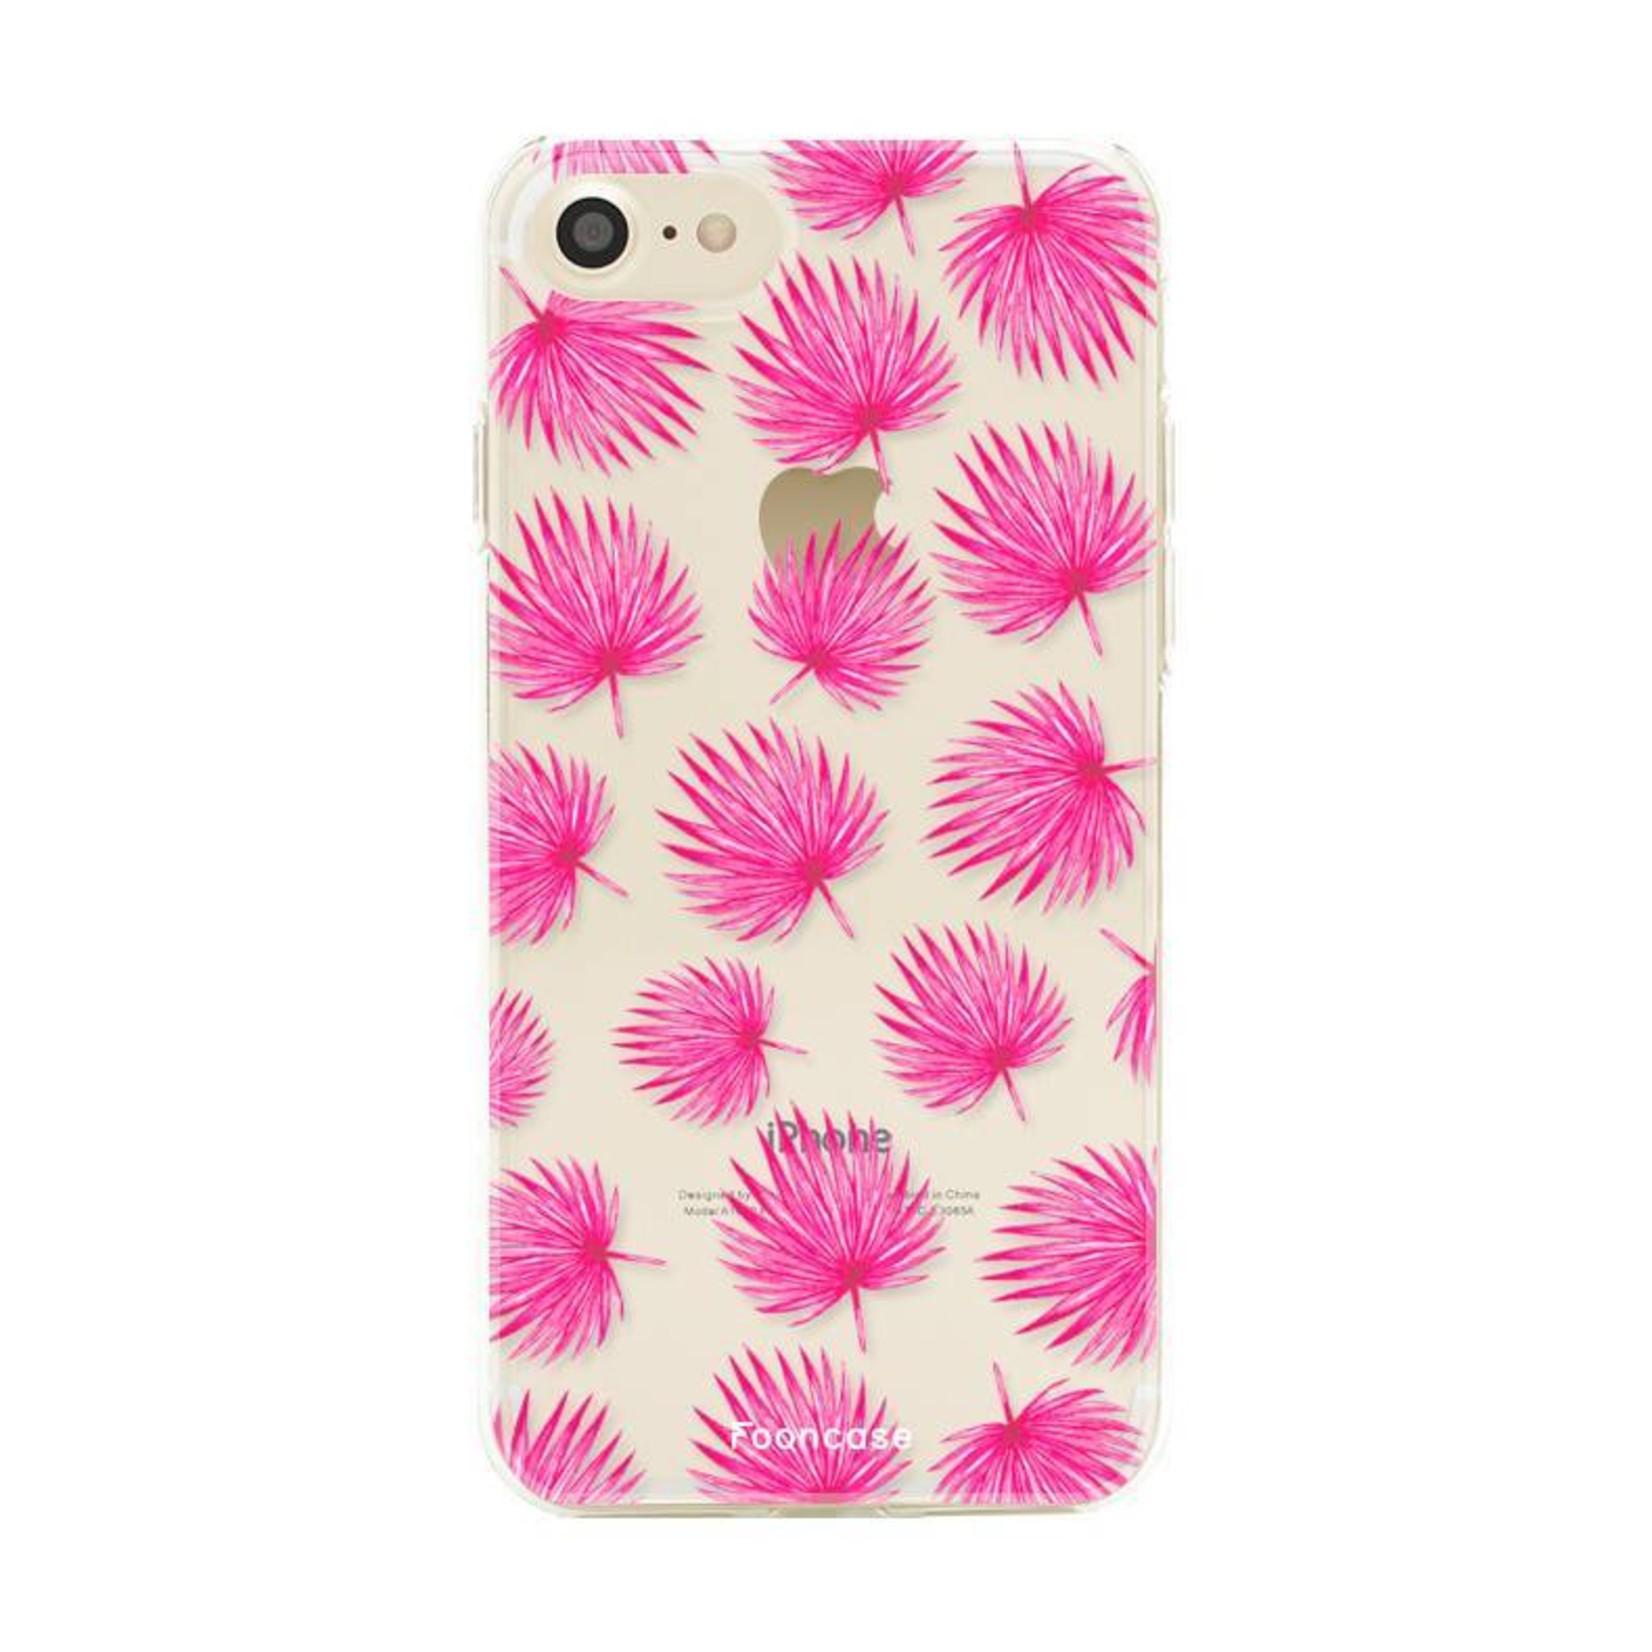 FOONCASE Iphone 7 Handyhülle - Rosa Blätter